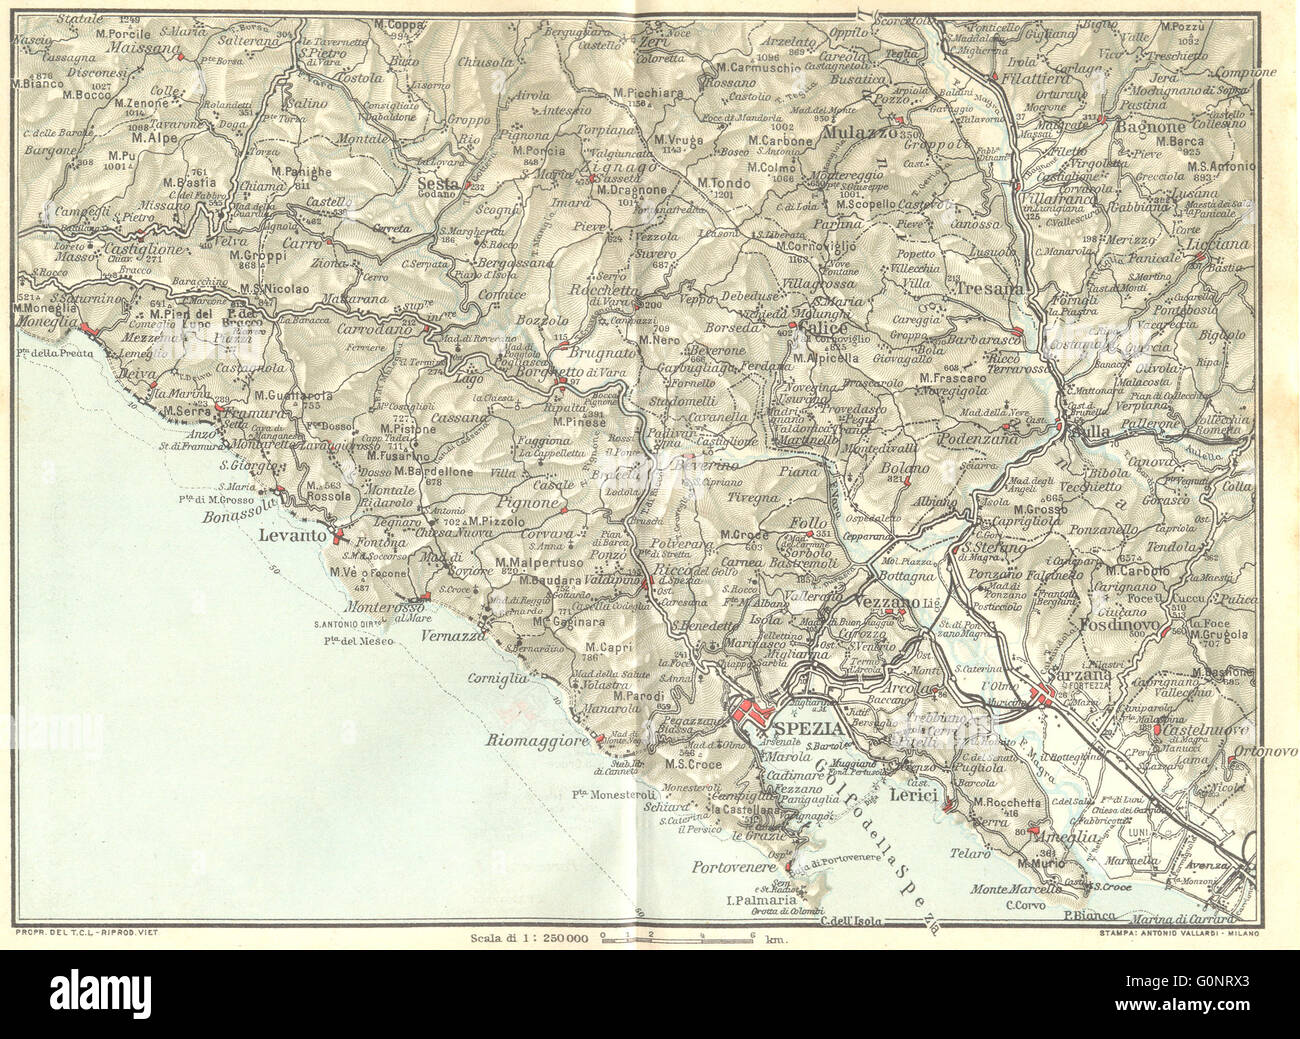 Italy Moneglia La Spezia Levanto Sarzana 1926 Vintage Map Stock